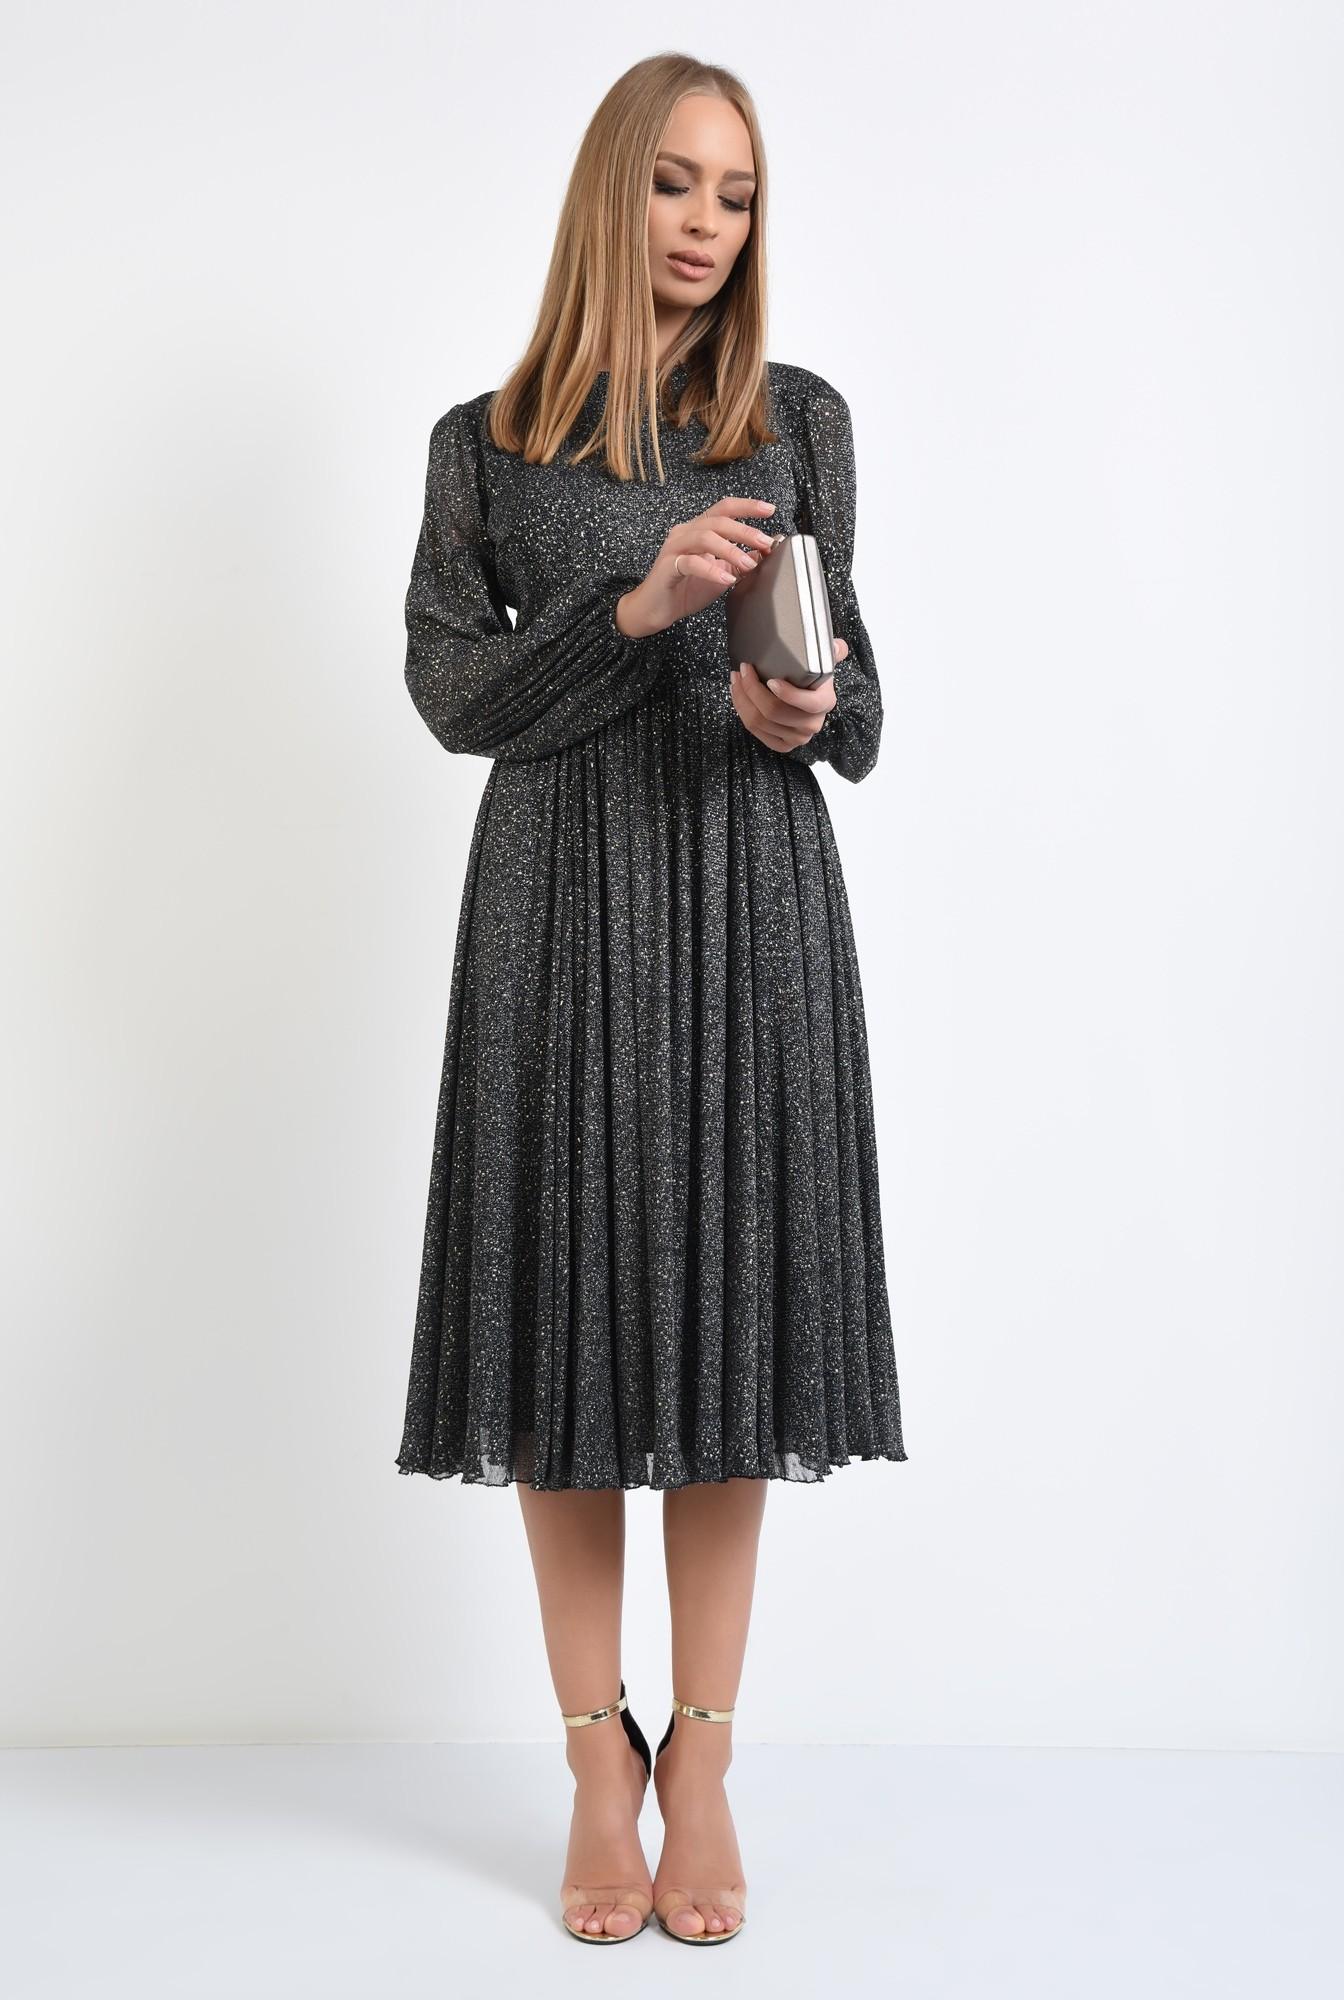 3 - rochie de seara, detalii aurii, rochii online, croi clos